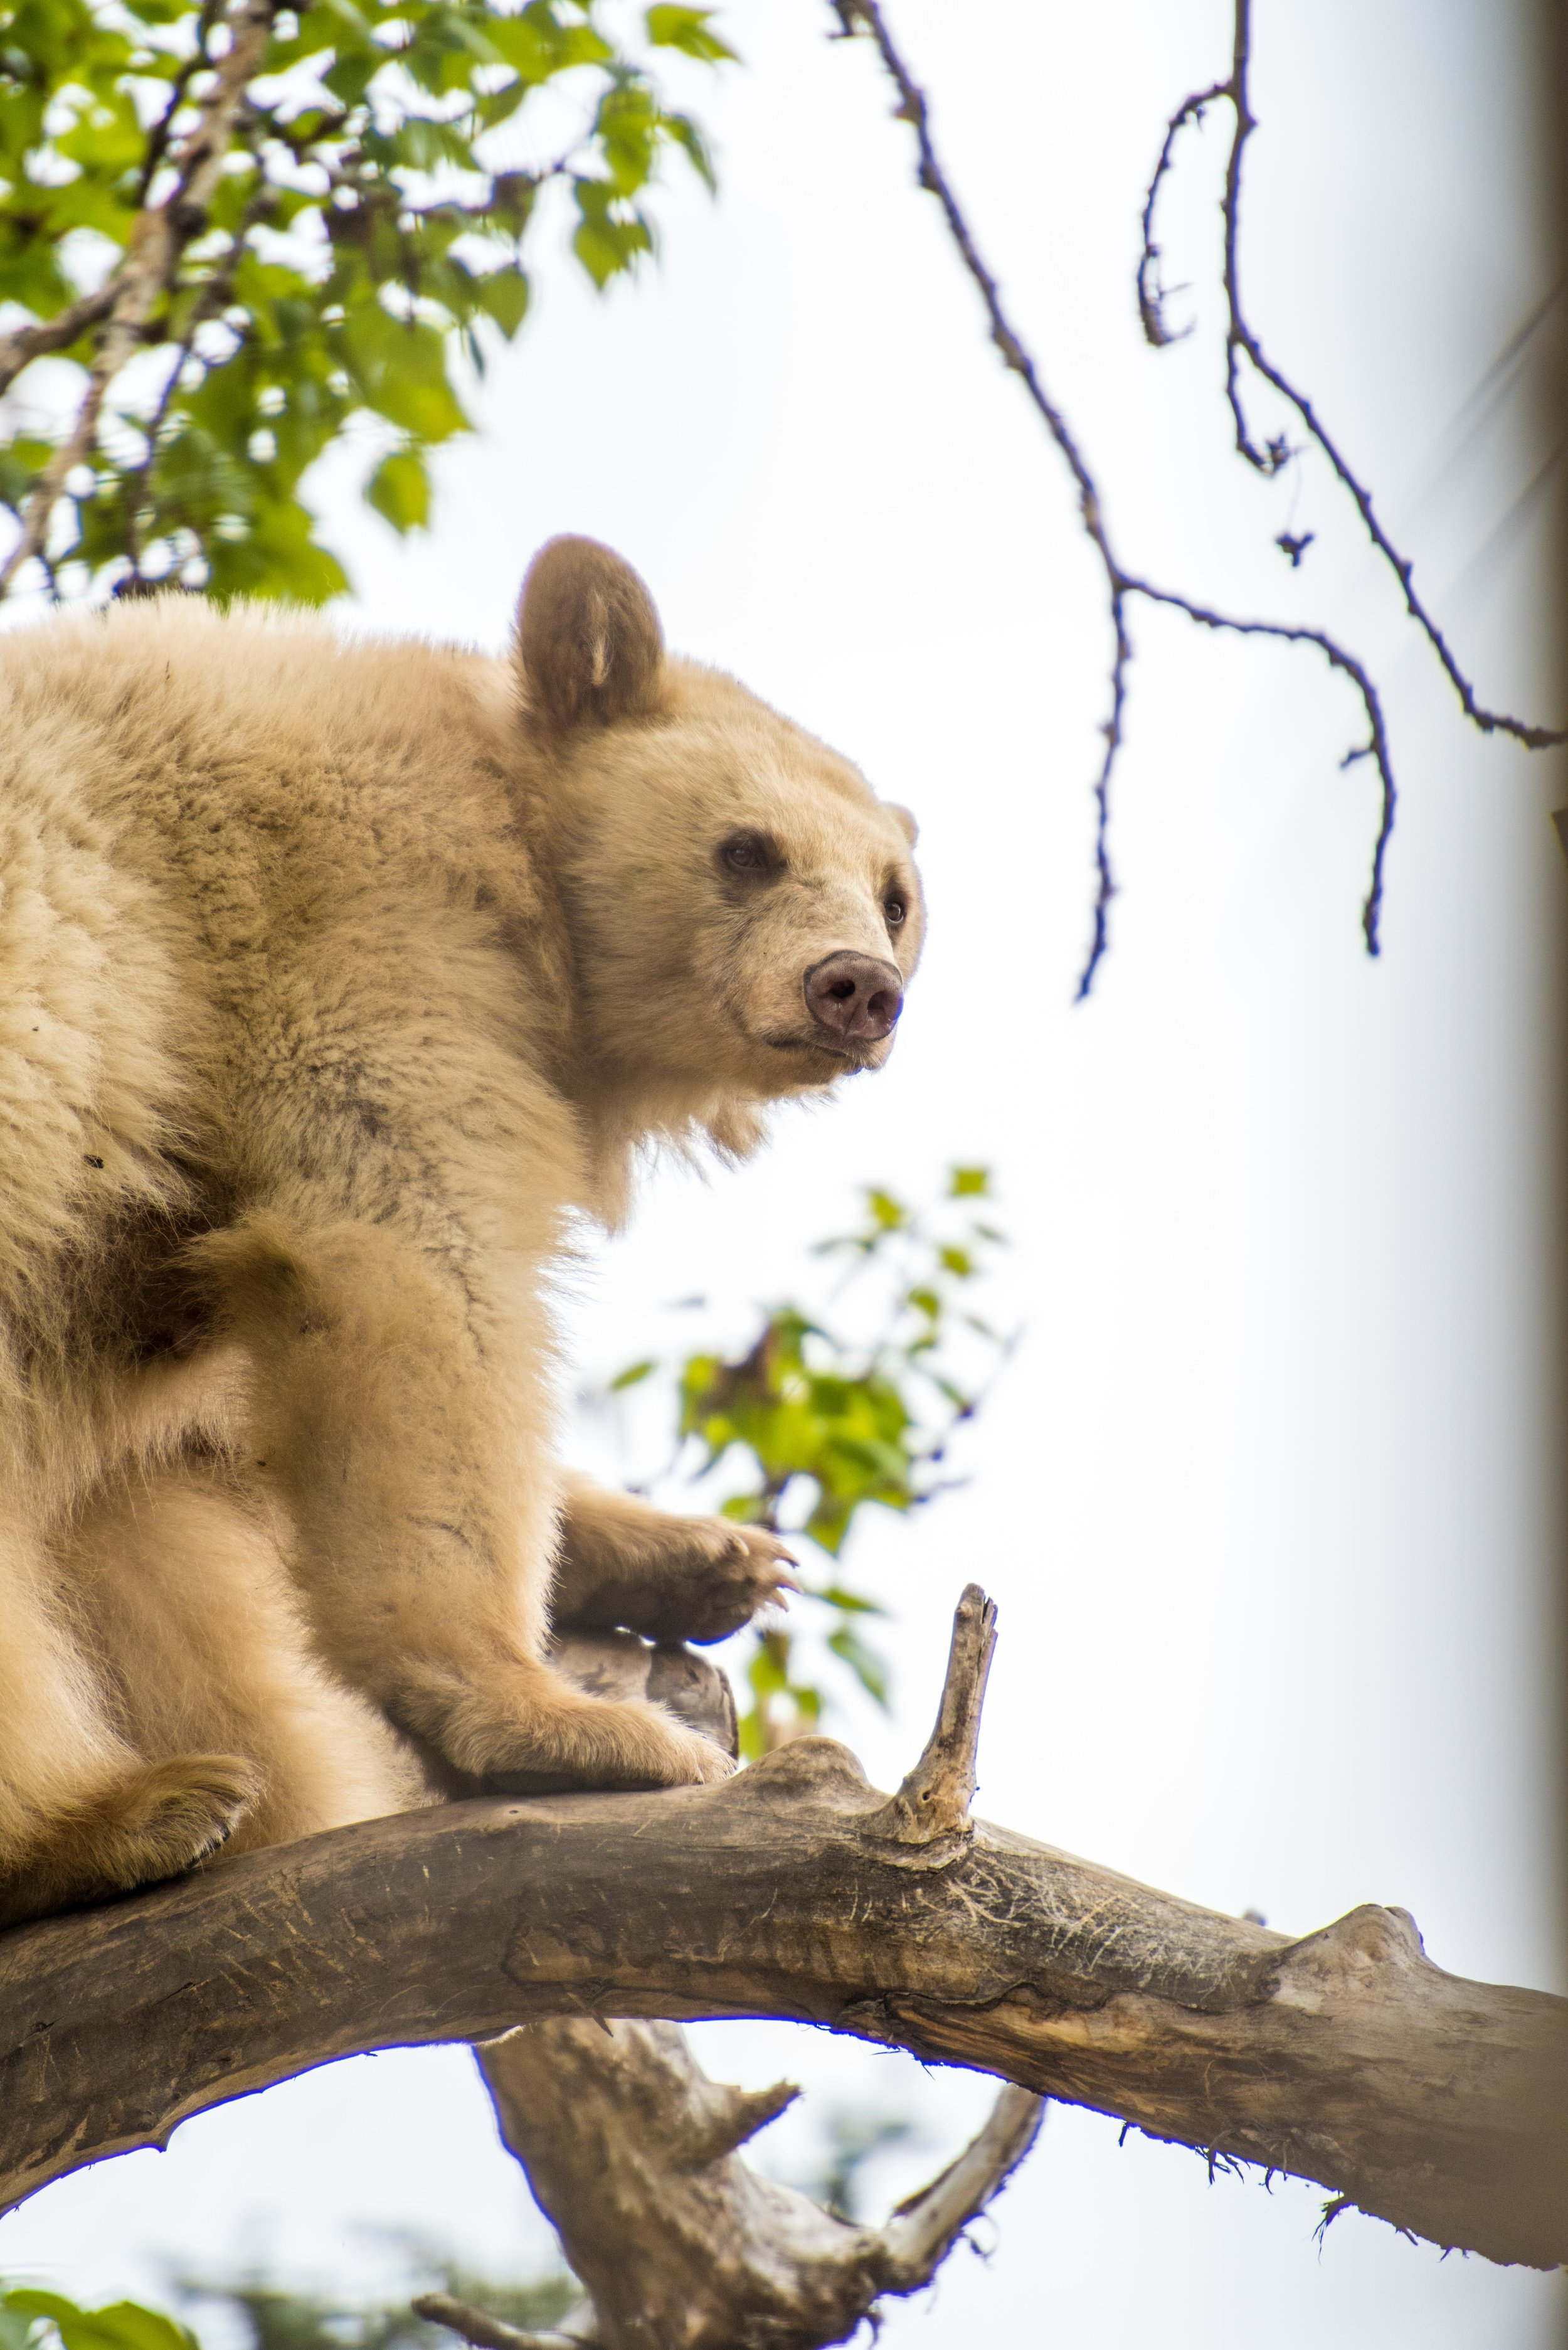 calgary zoo-3544.jpg